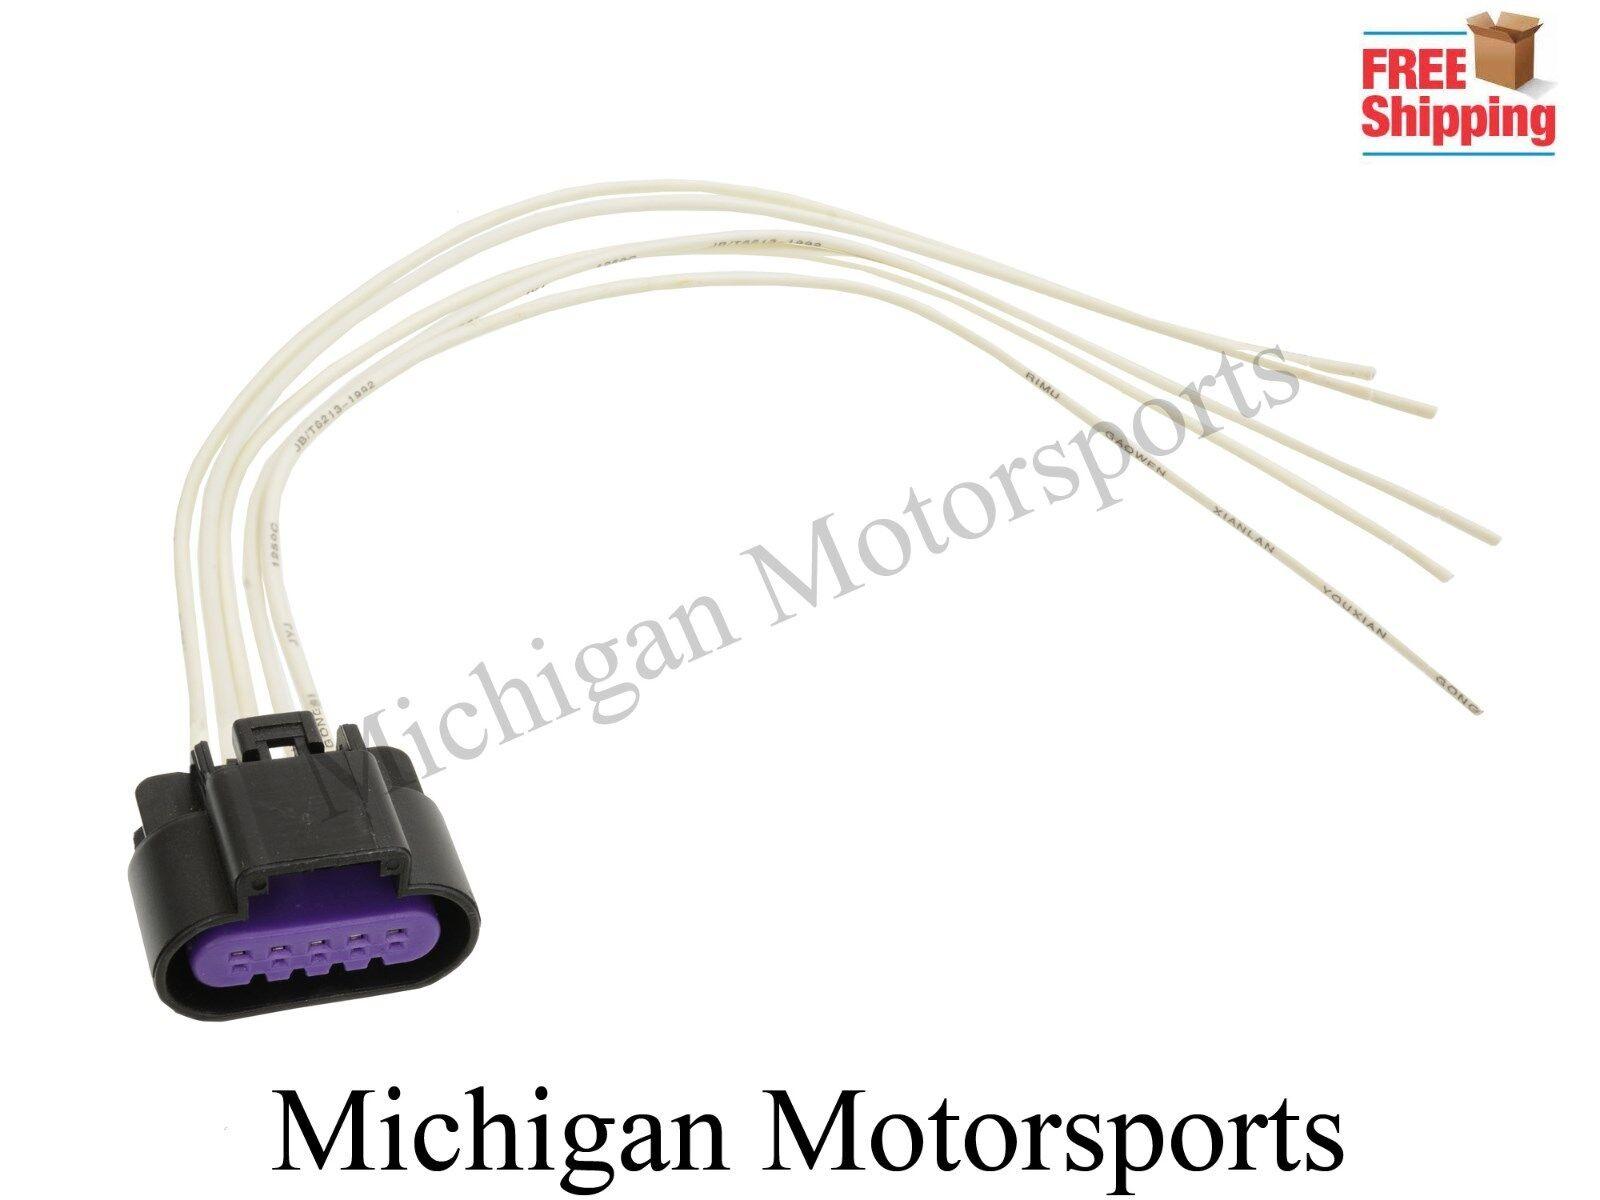 brake tail light repair wire harness gm circuit board repair you re almost done brake tail light repair wire harness